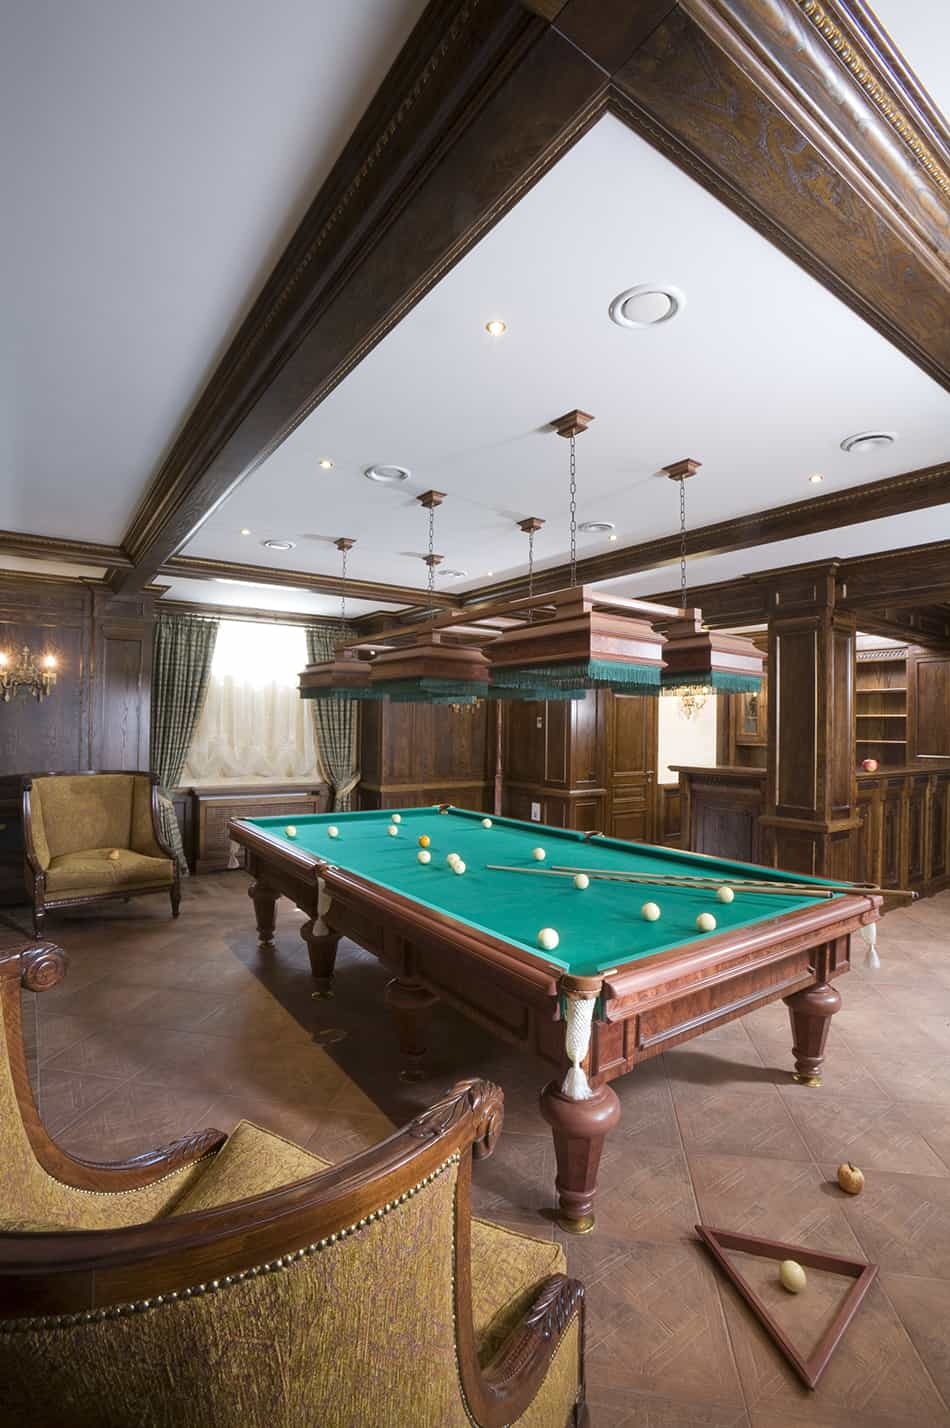 Bar with Billiards Table 2